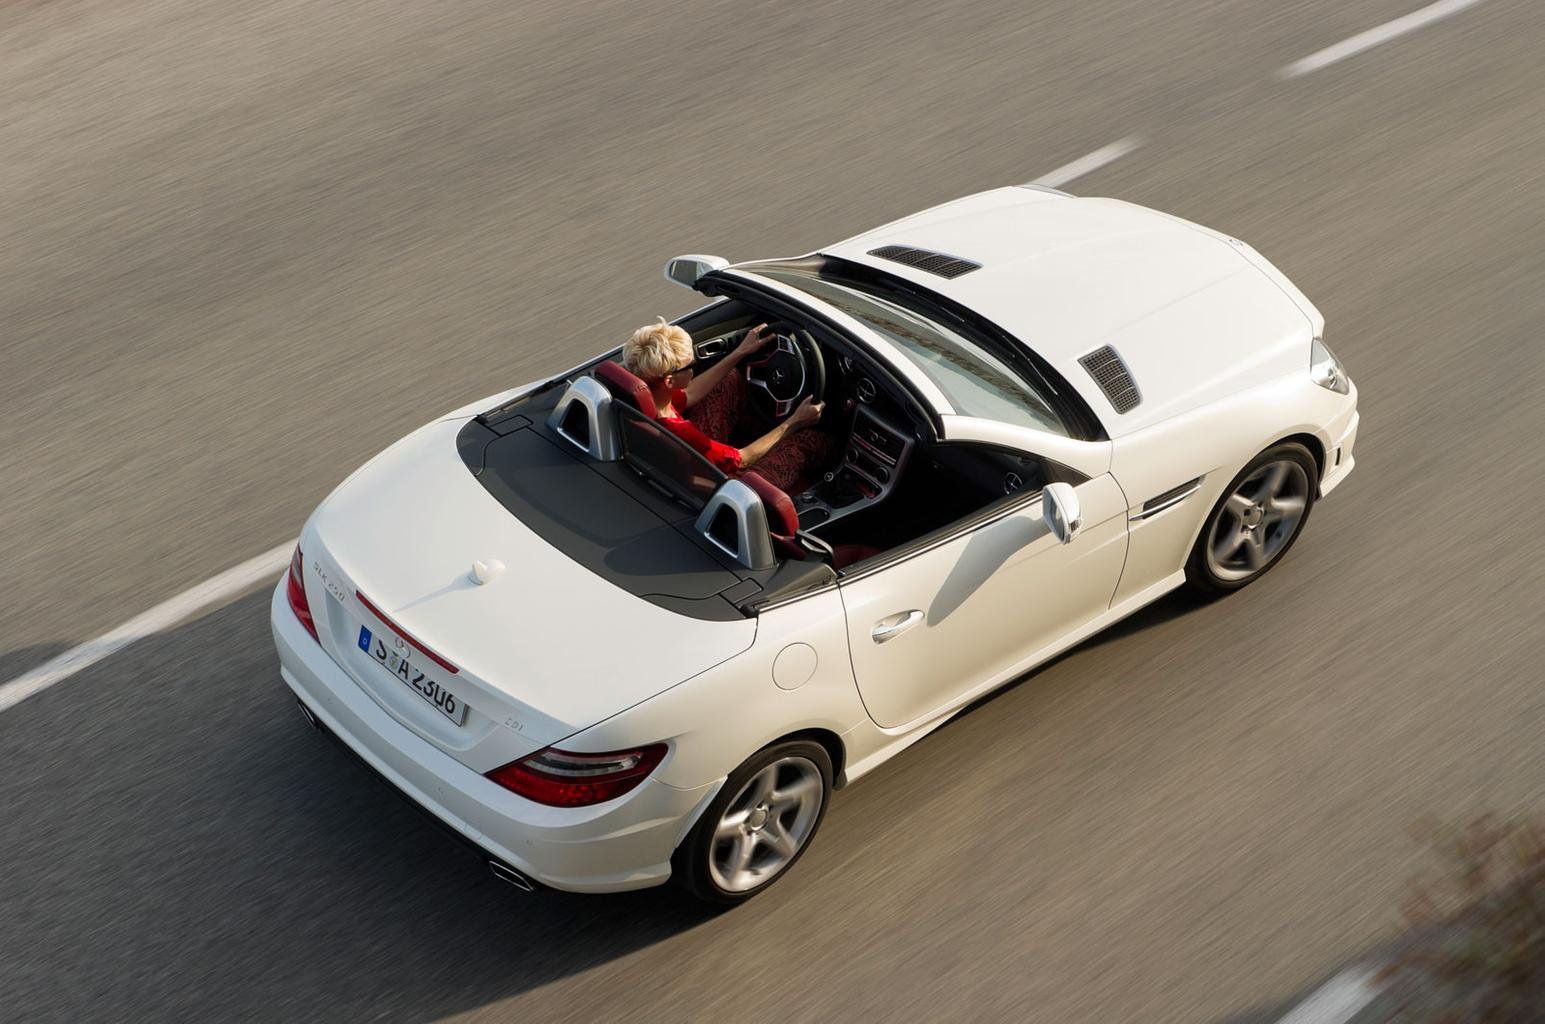 Mercedes-Benz SLK (2004-2011)